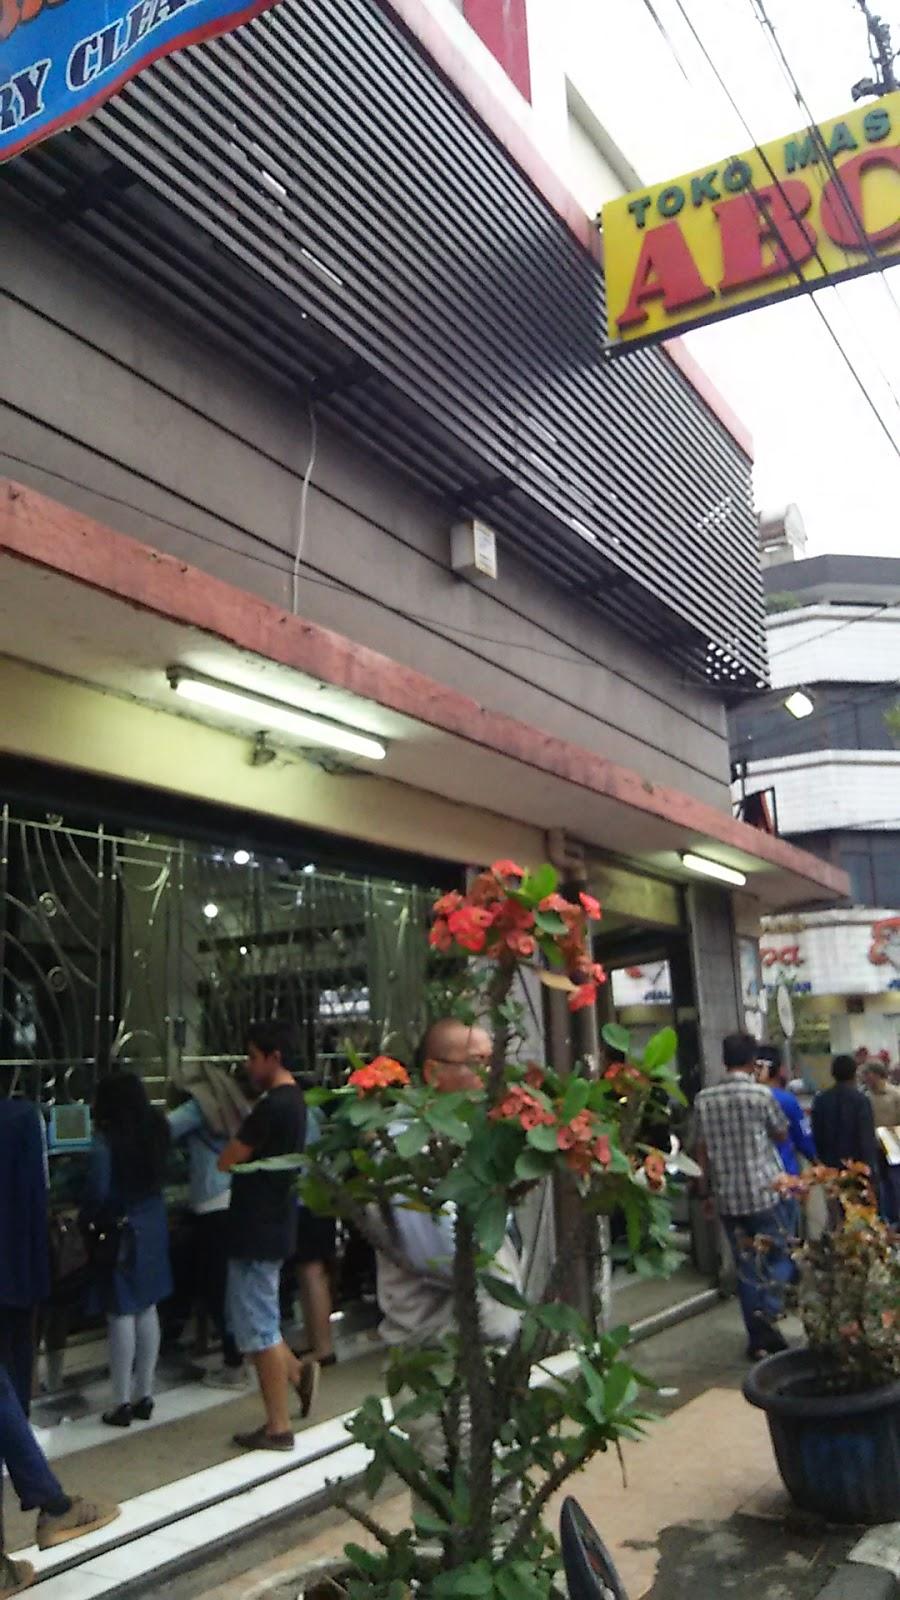 Toko Abc Bandung : bandung, Kepatihan,, Iskandar, Dinata, No.245,, Balonggede,, Regol,, Bandung,, Barat, 40251,, Indonesia